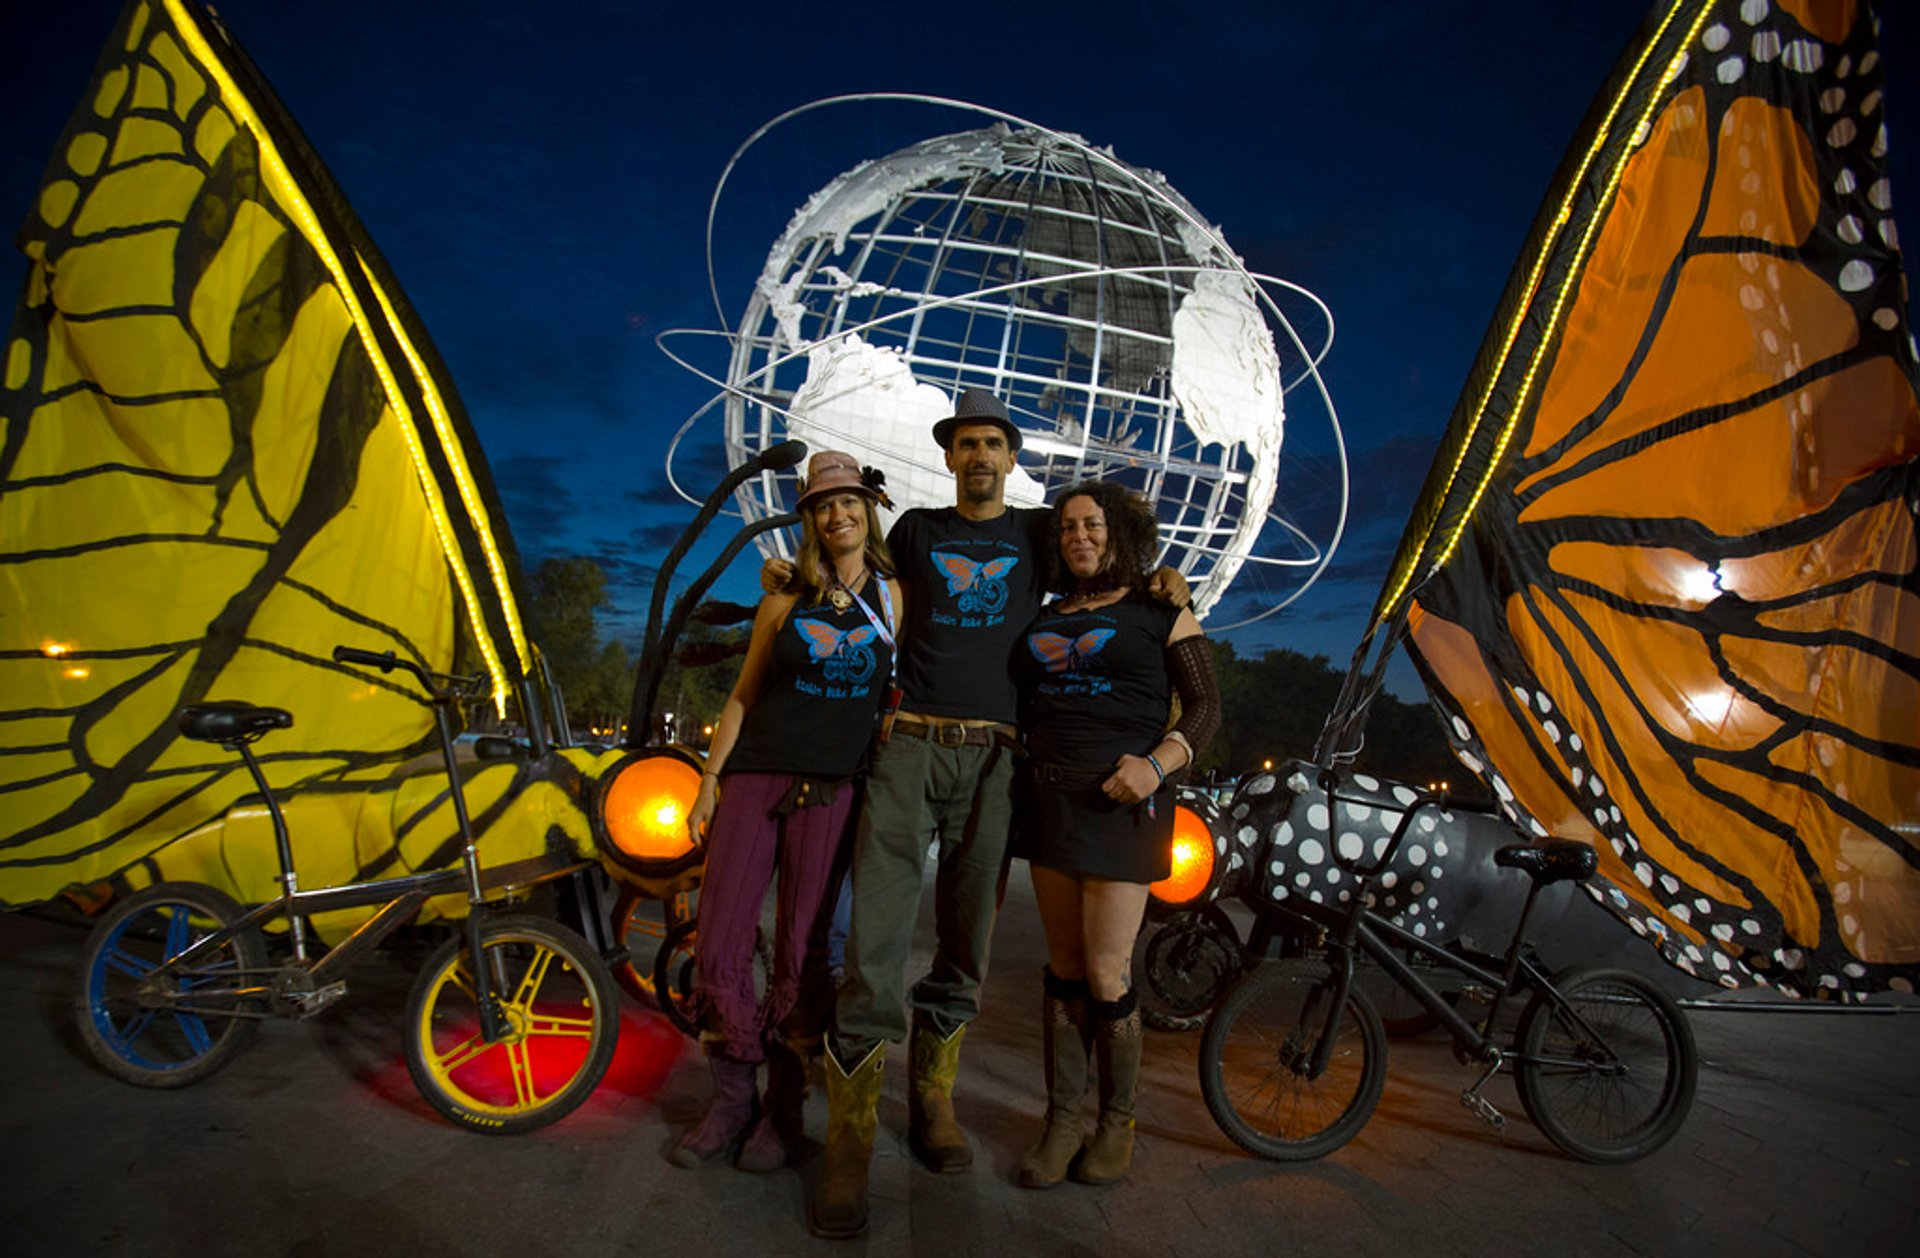 World Maker Faire in New York 2020 - Best Time